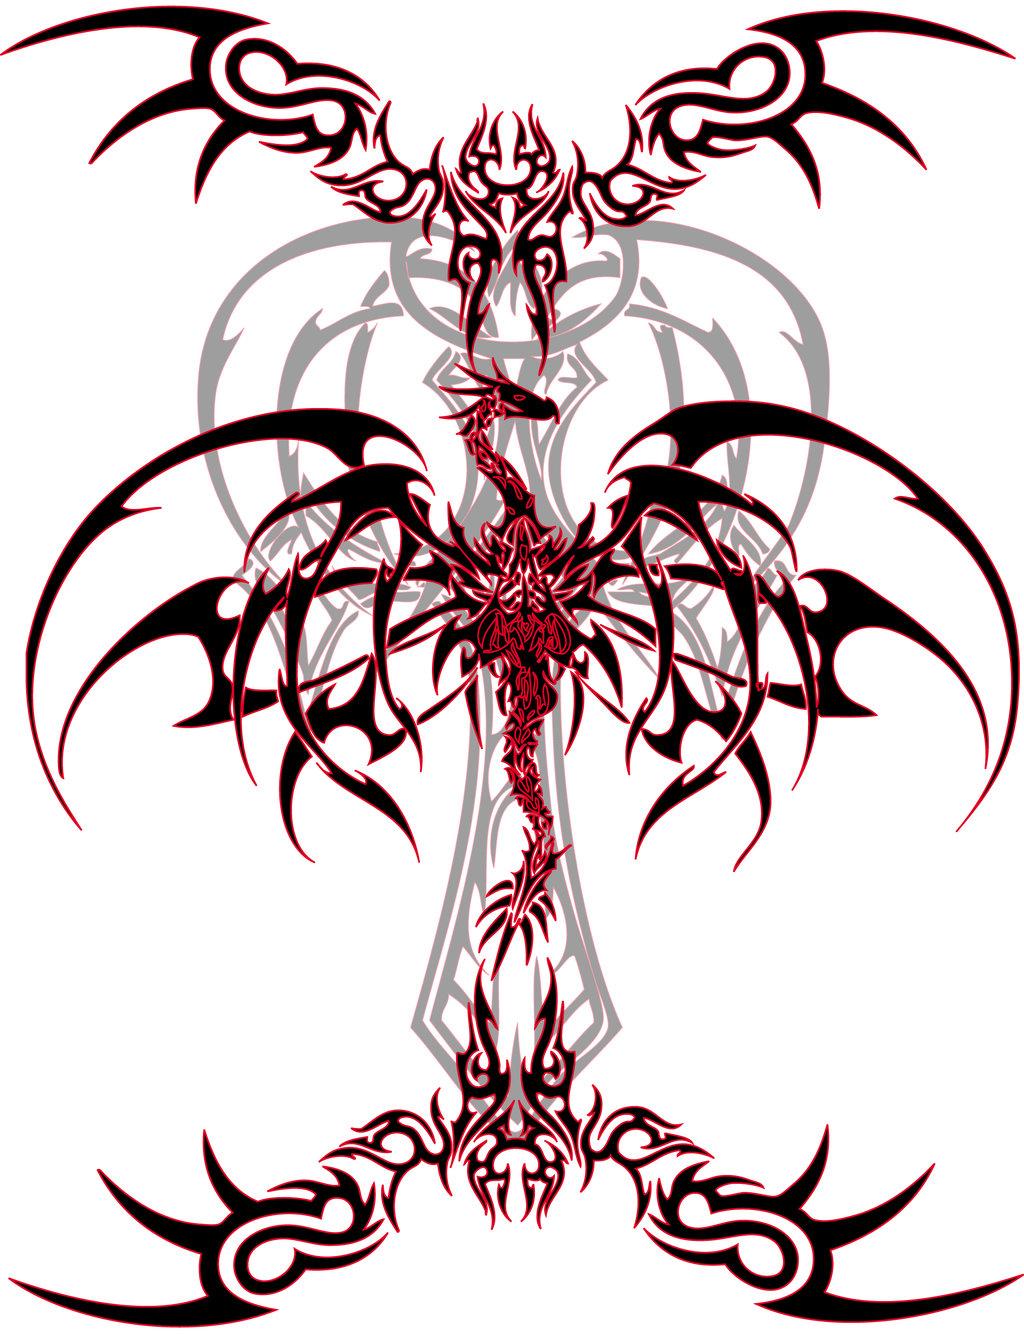 Dragon_Tattoo_Vinyl_by_VeXiiNo